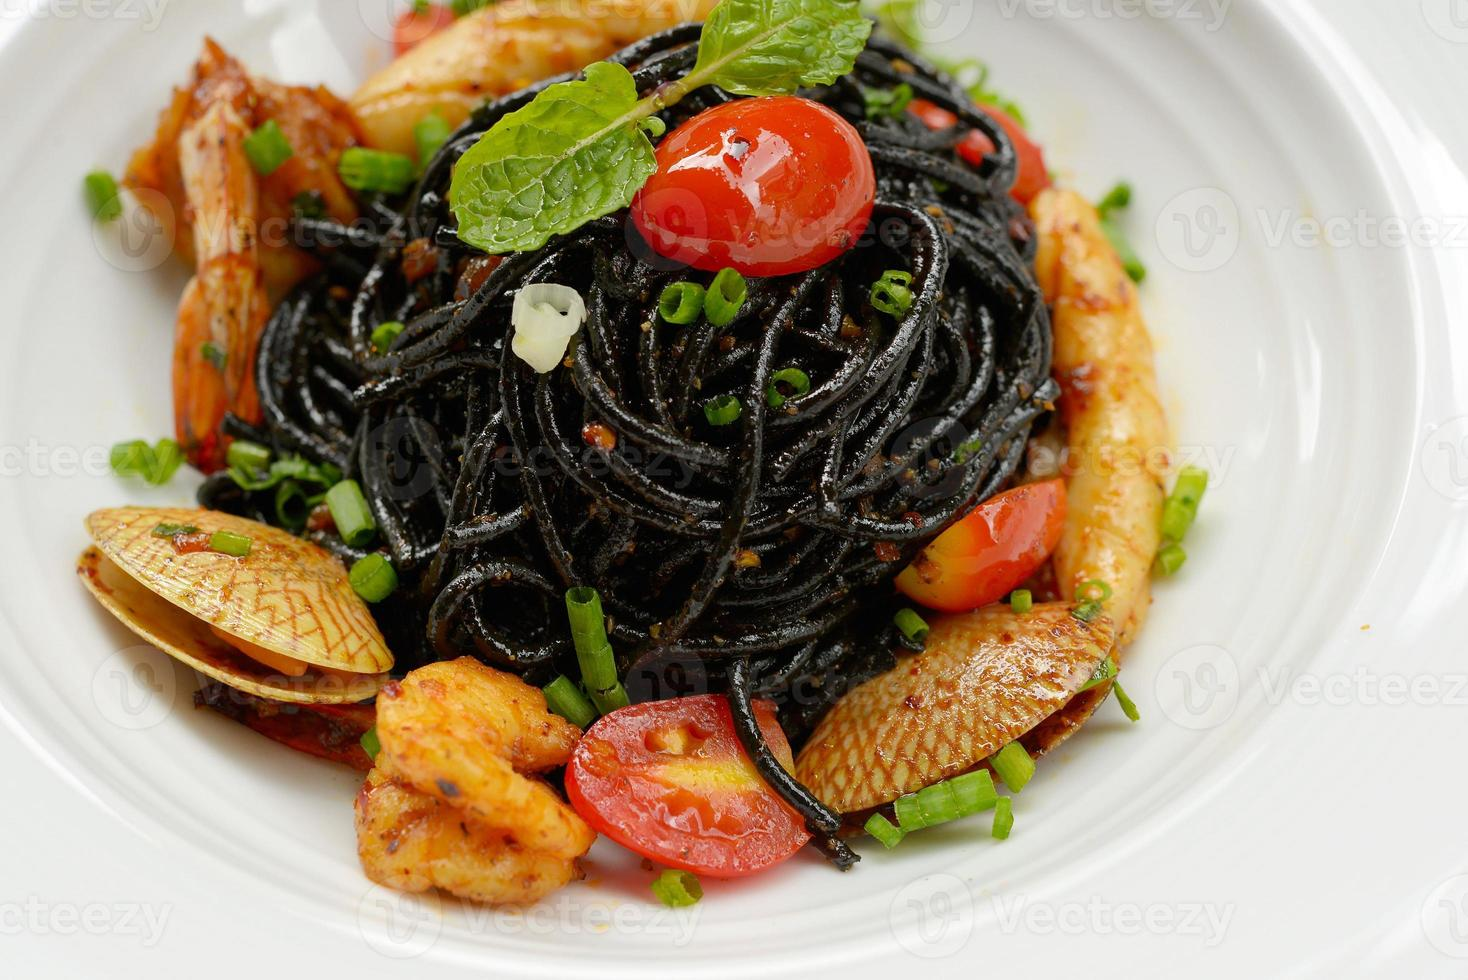 salsa de espagueti negro, chile, mariscos. foto